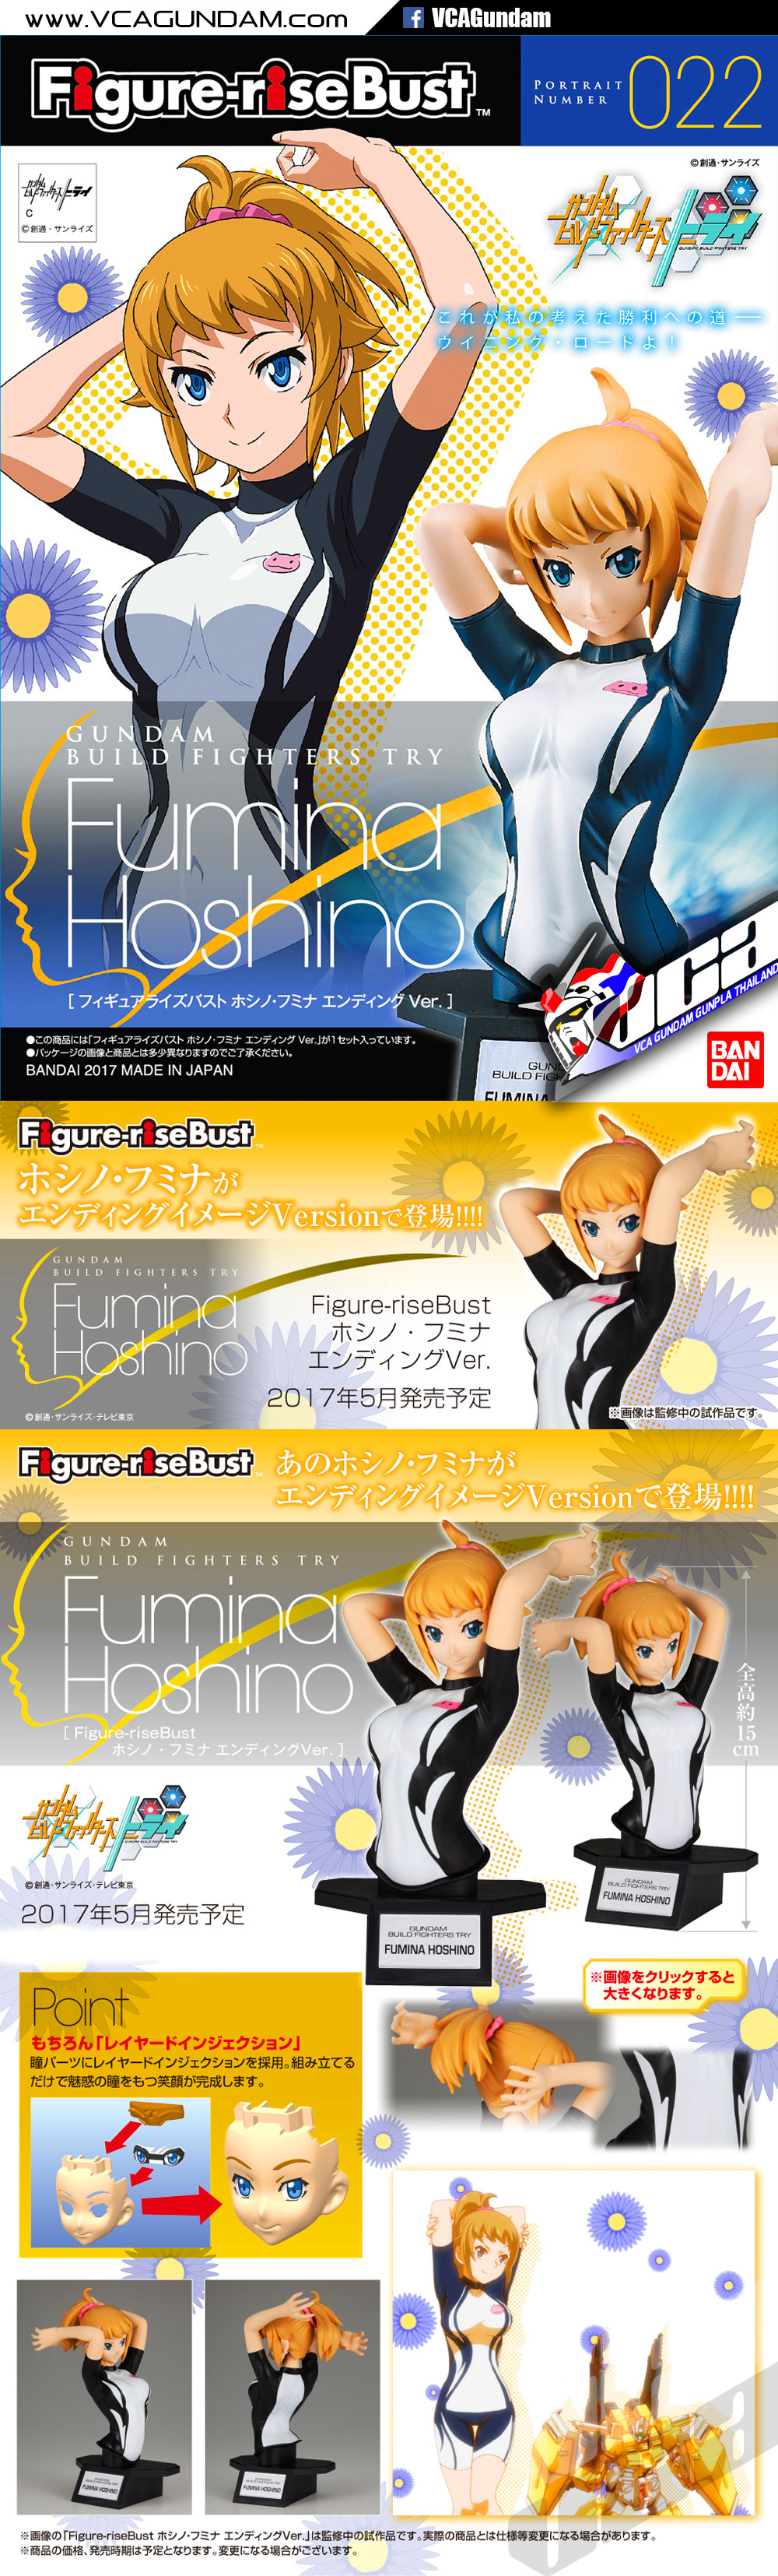 Figure-rise Bust FUMINA HOSHINO ฟูมินะ โฮชิโนะ